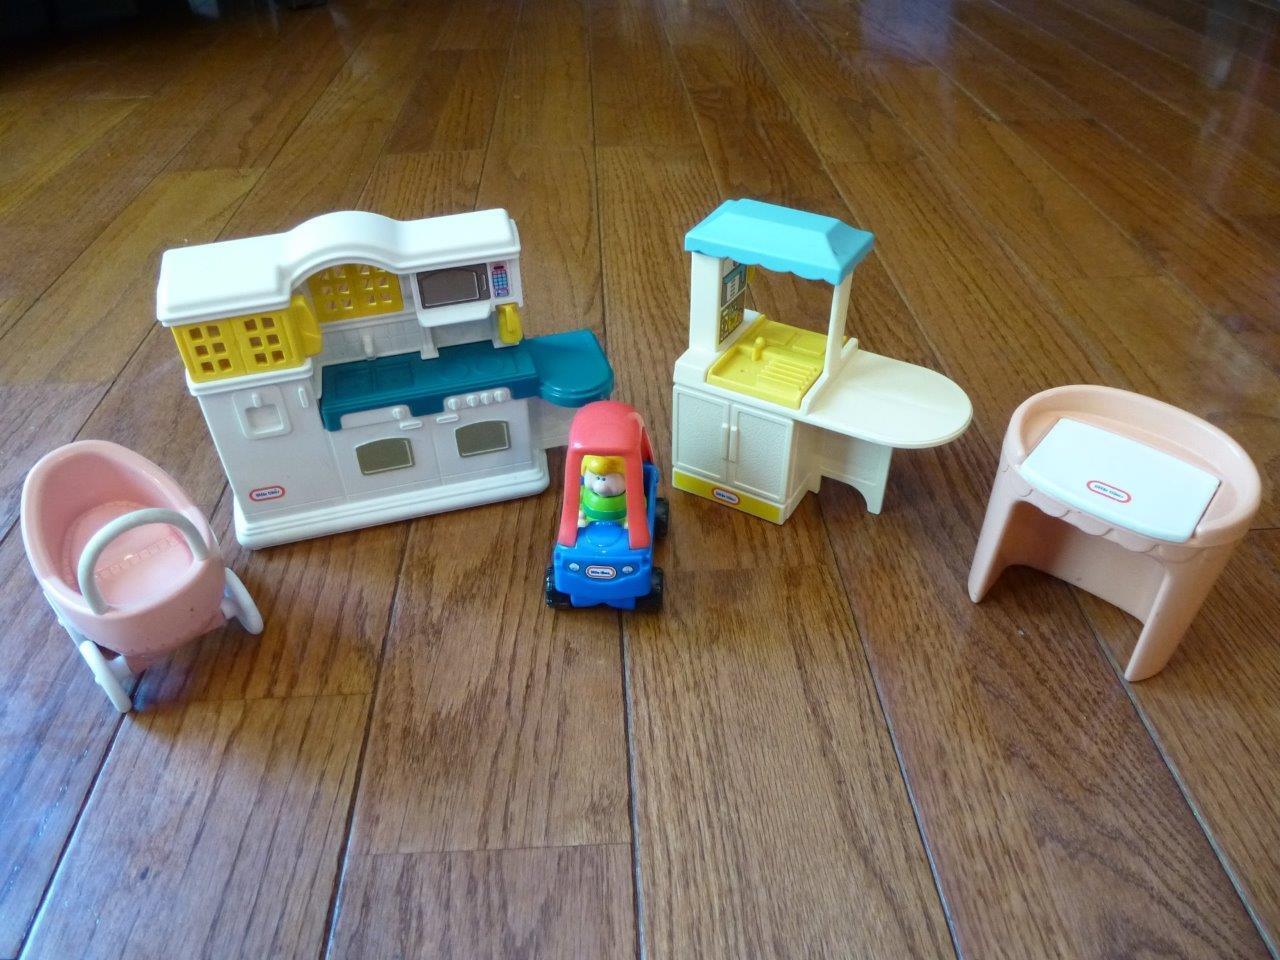 Little Tikes Dollhouse Furniture Furniture Furniture Kitchen Baby Stroller Car Vintage Vanity Tykes fa5c5c